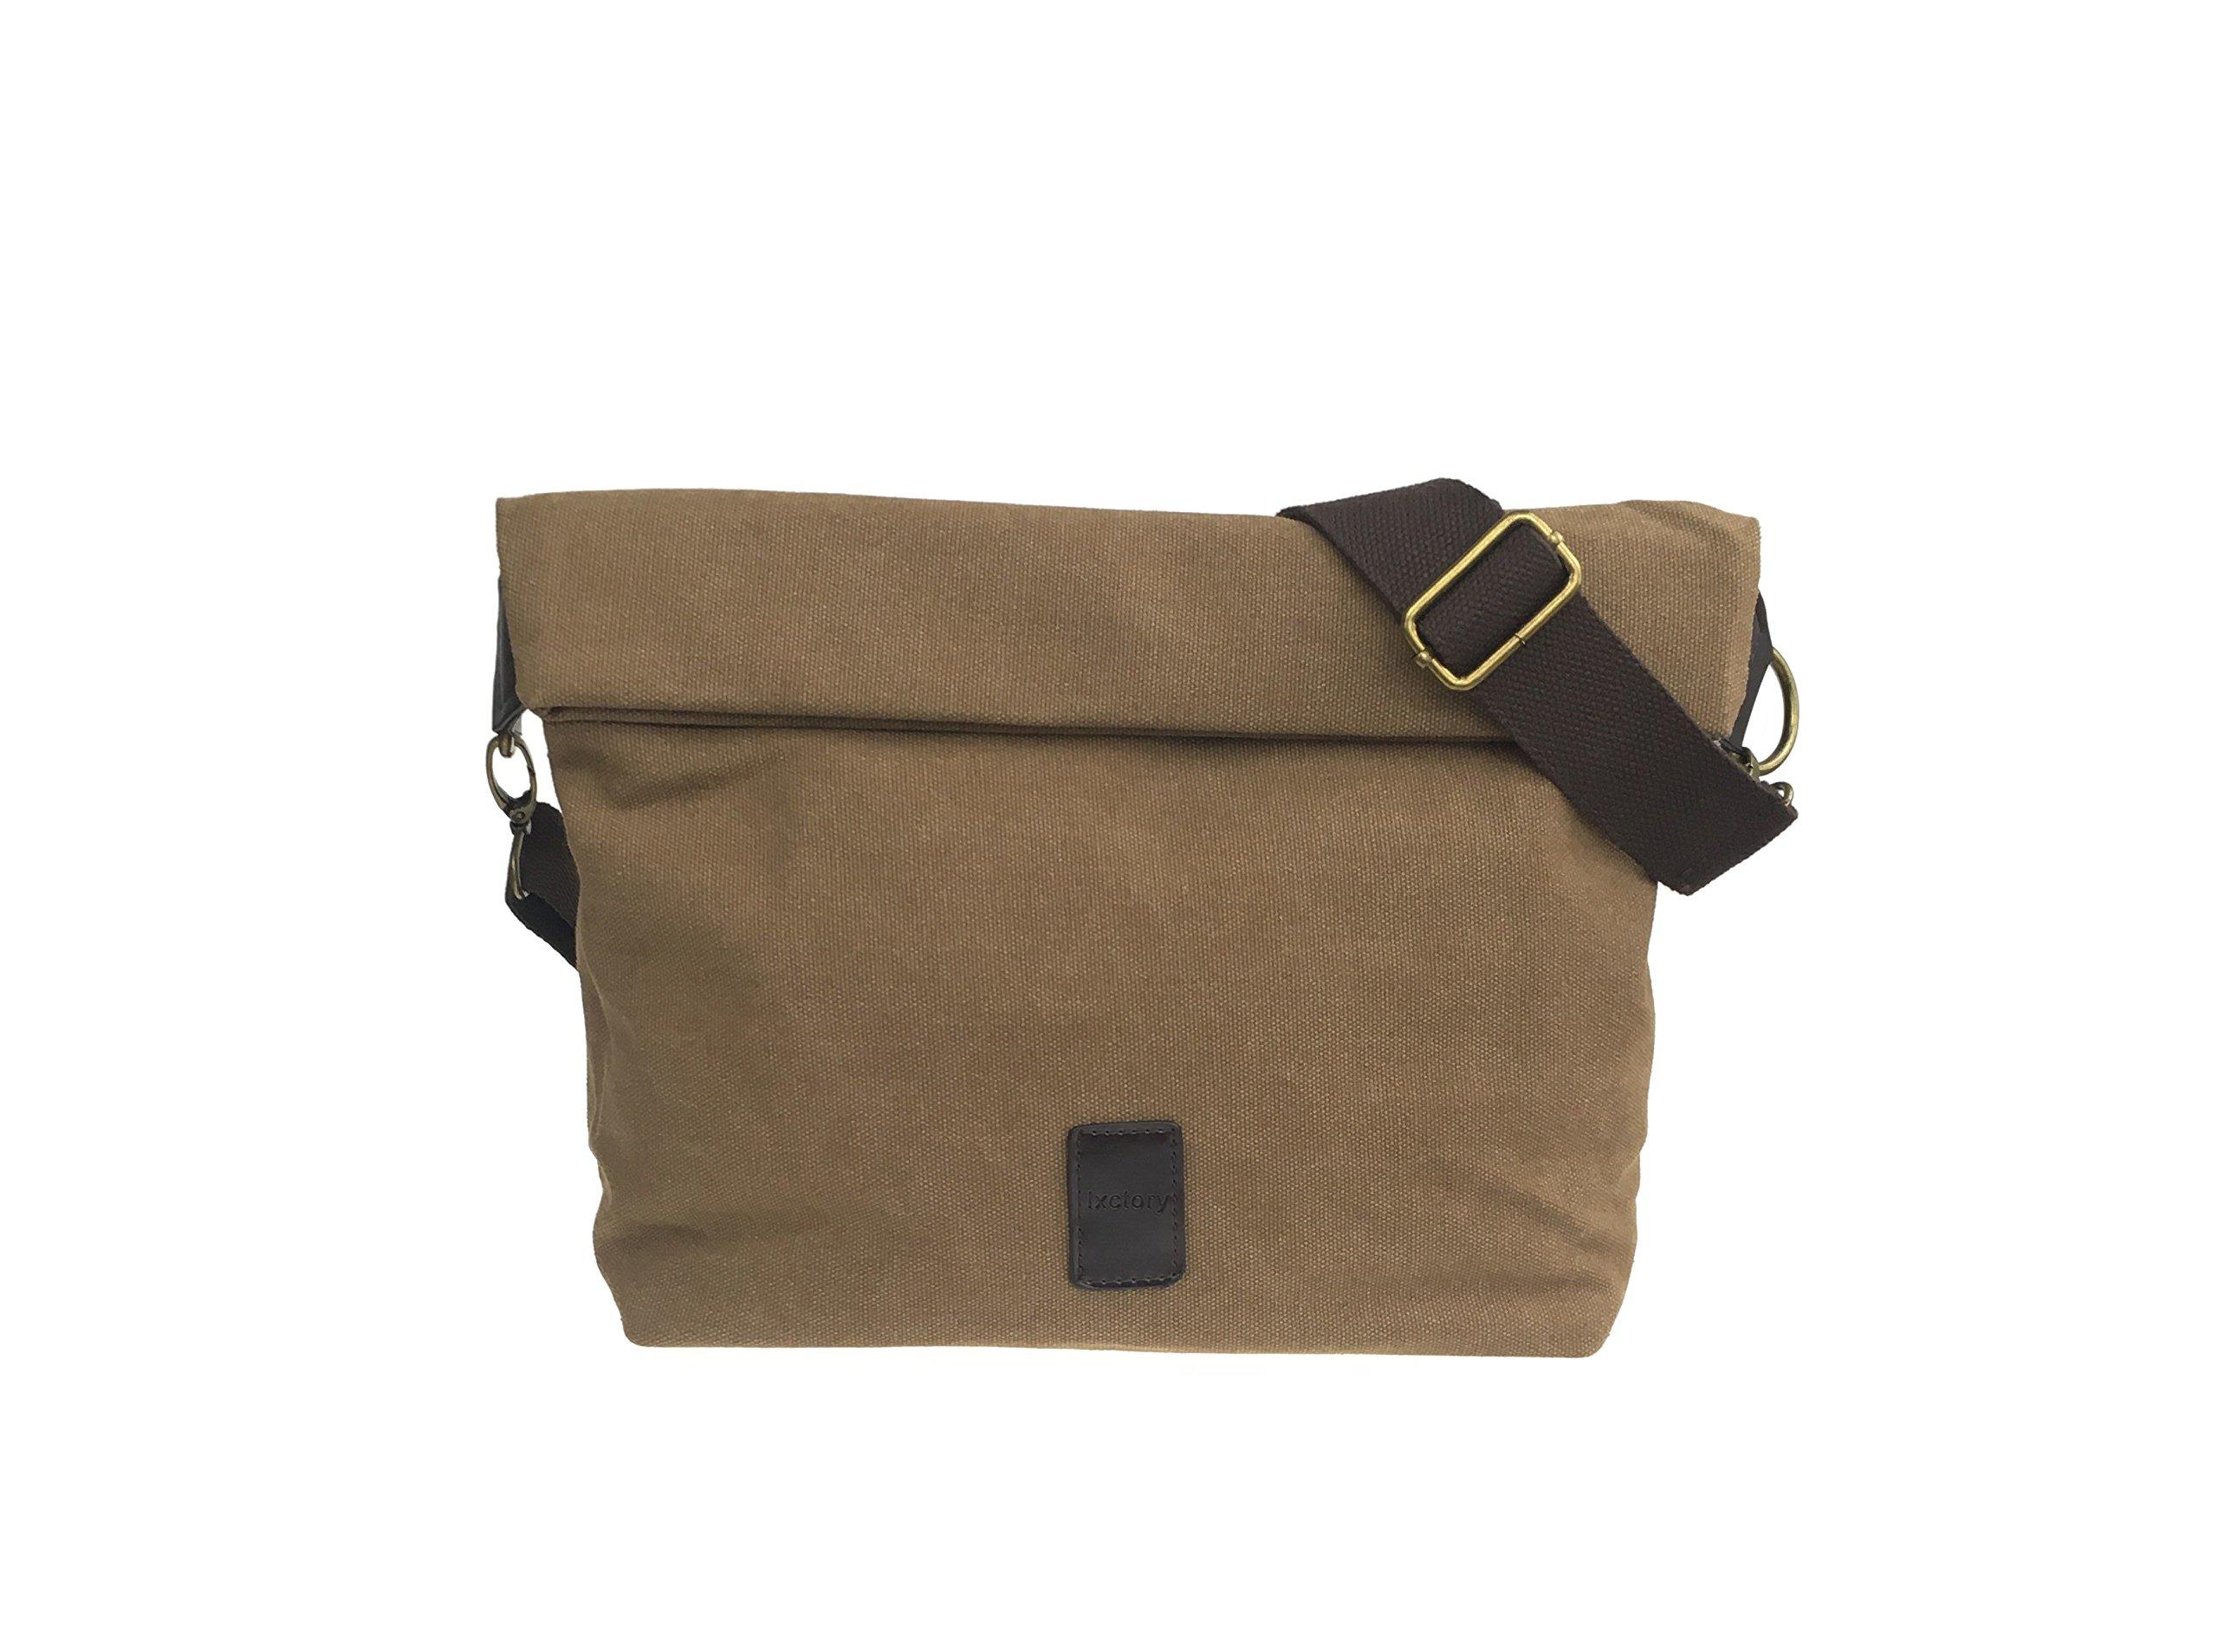 Canvas Shoulder Bag Classic Cross body Sling Bag Messenger Bag for Daily Using Etc (Brown)